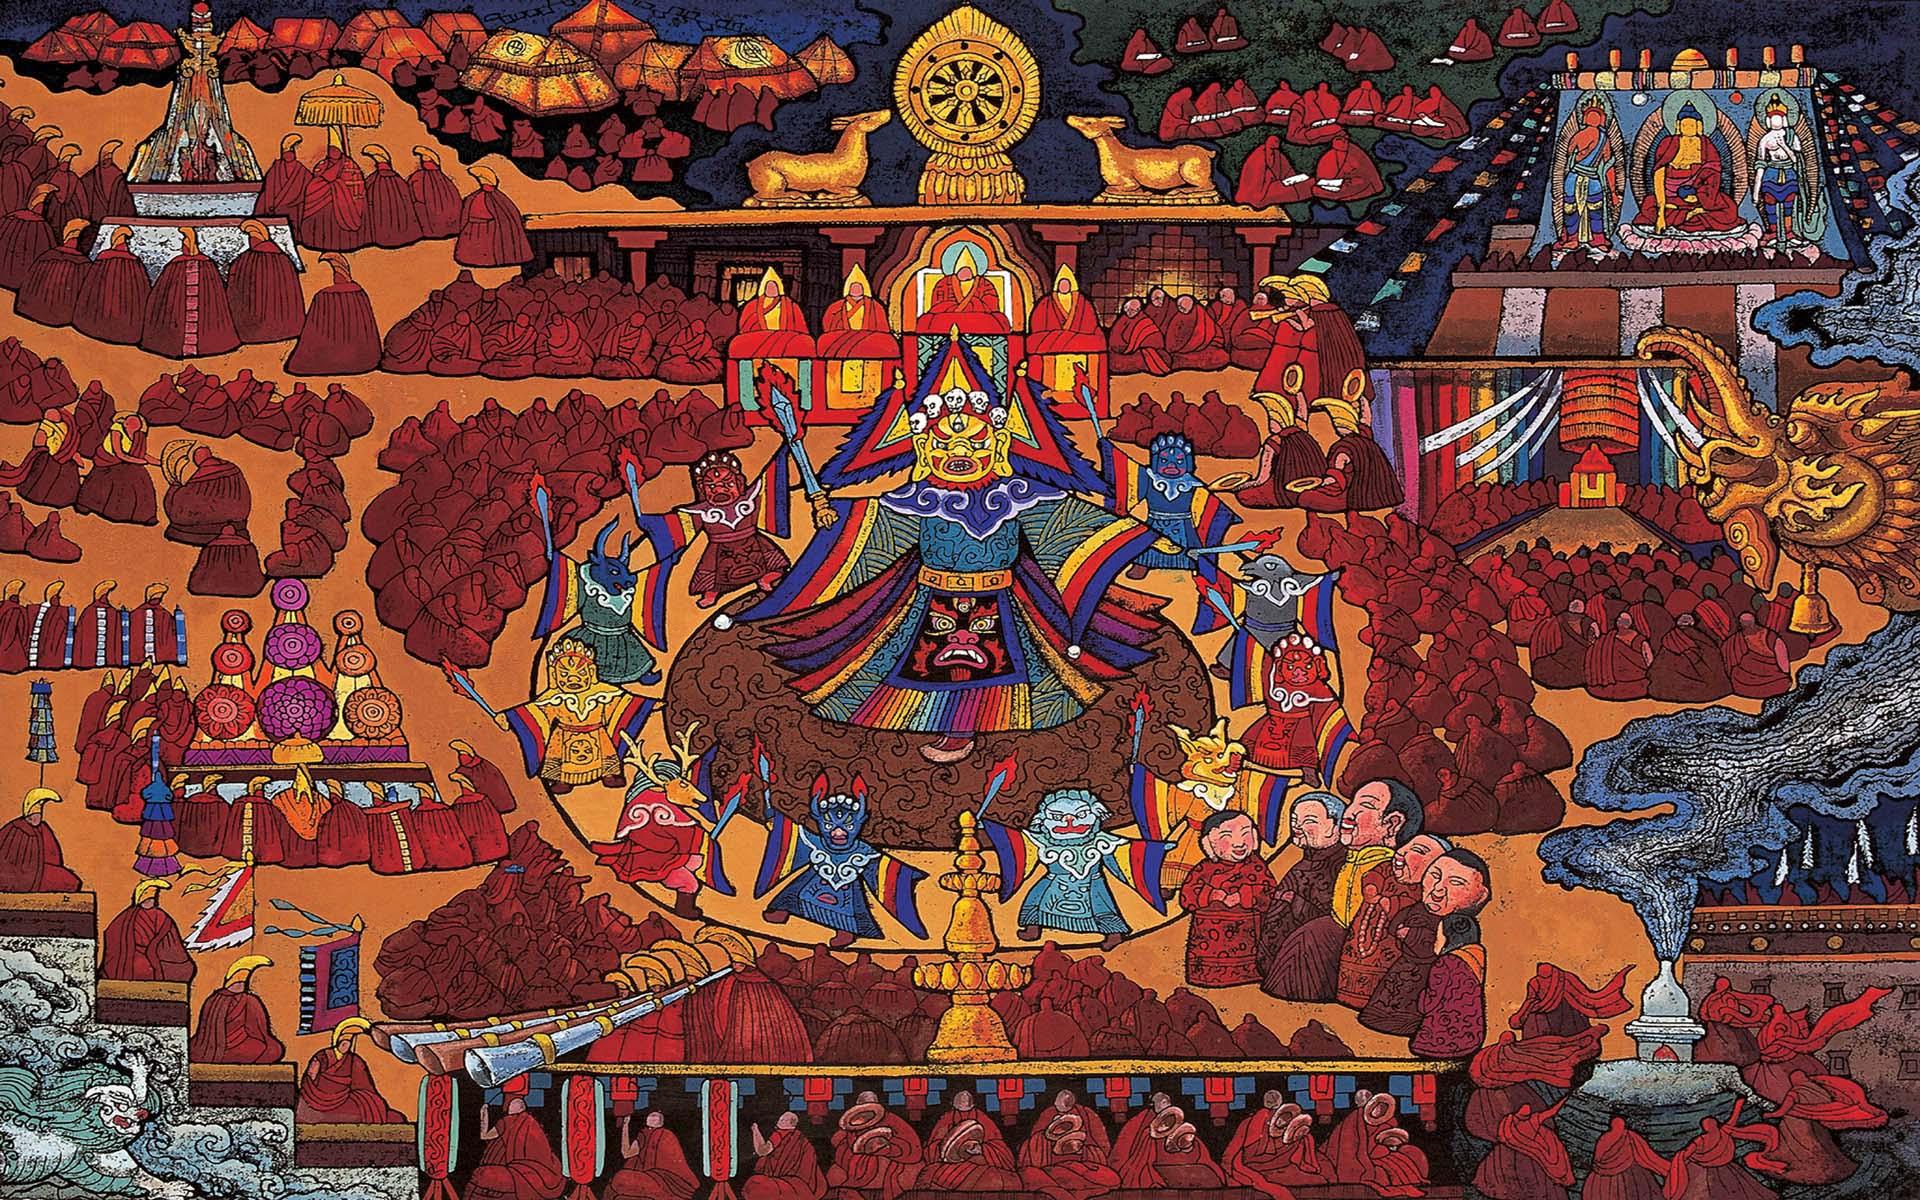 tibetan art 29 hd tibetan art 26 hd tibetan art 23 hd tibetan art 20 1920x1200